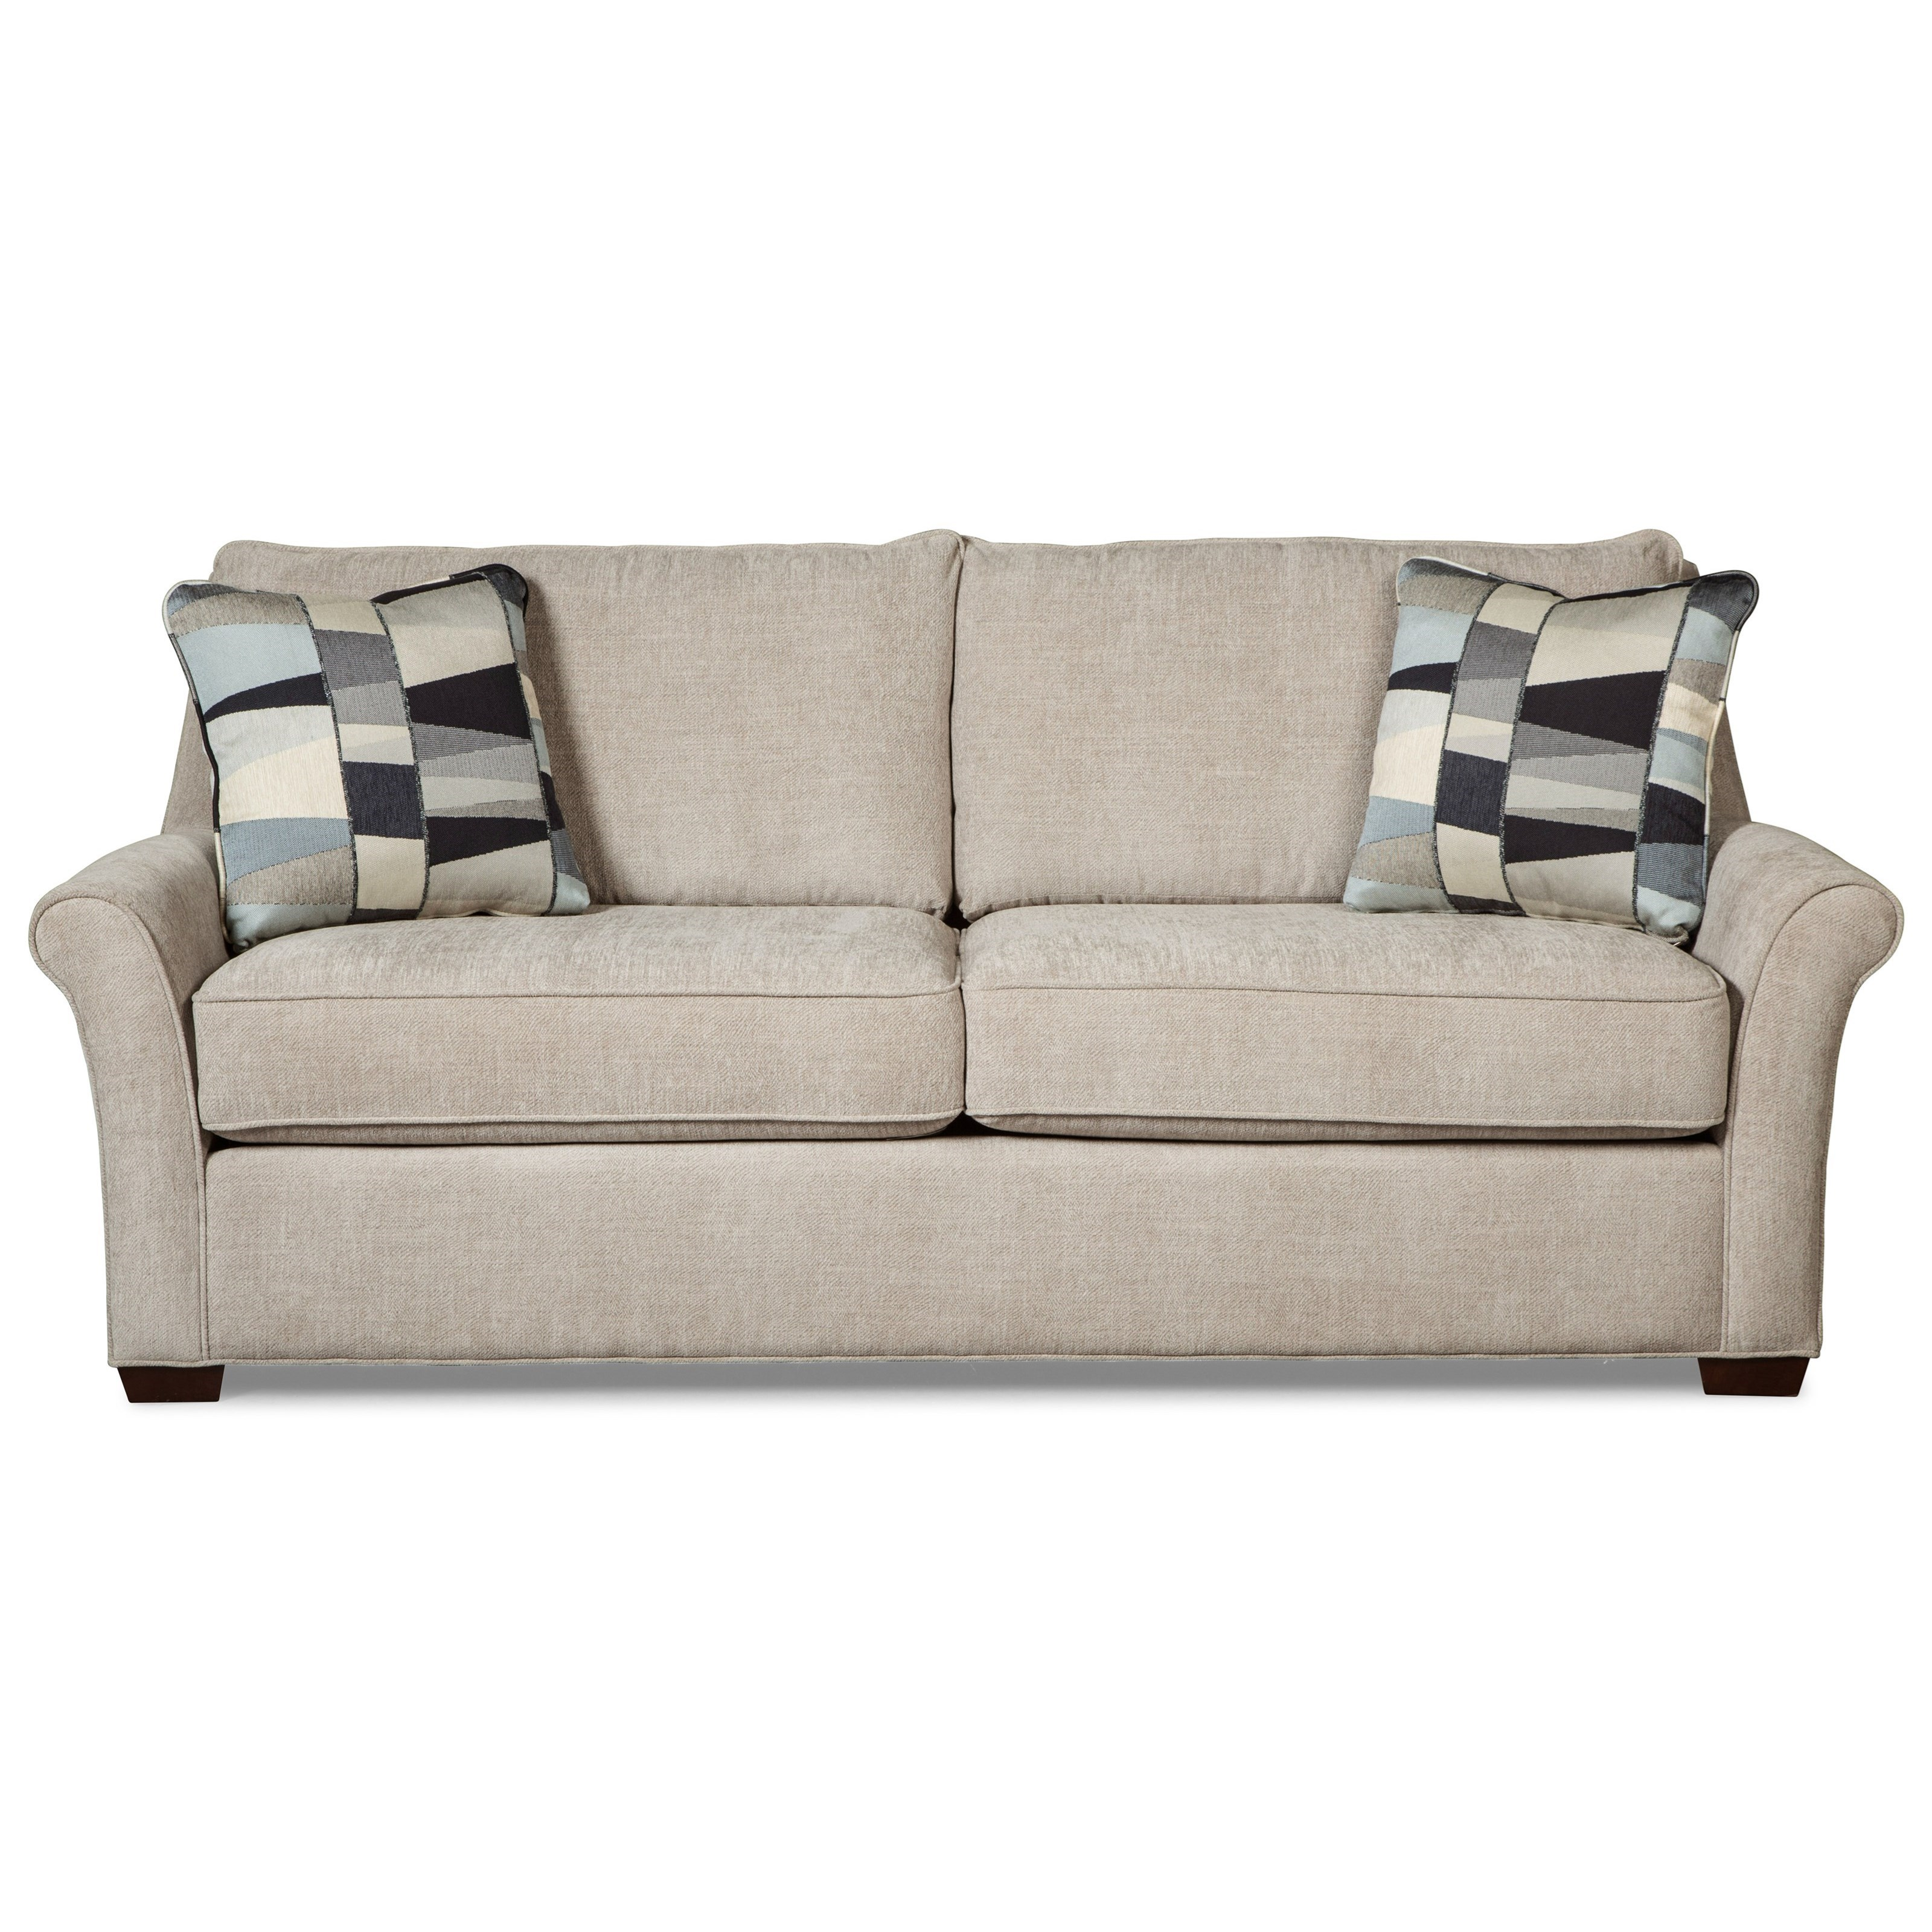 Craftmaster 7686 Queen Sleeper Sofa W/ Innerspring Mattress   Item Number:  768650 68